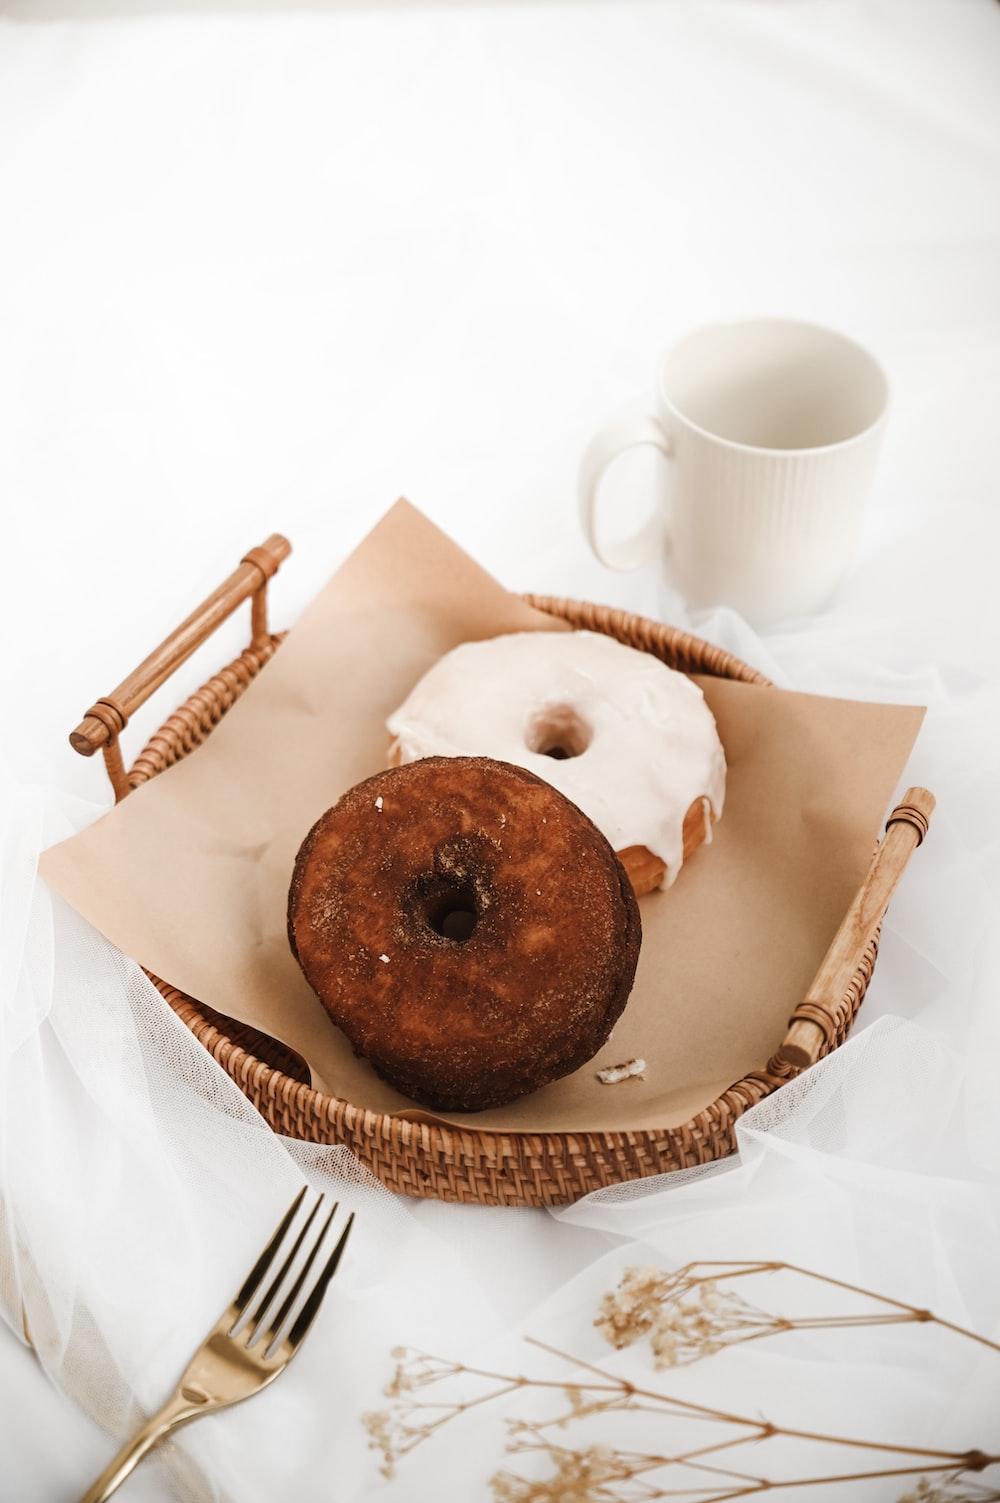 chocolate chip cookies on brown paper bag beside white ceramic mug